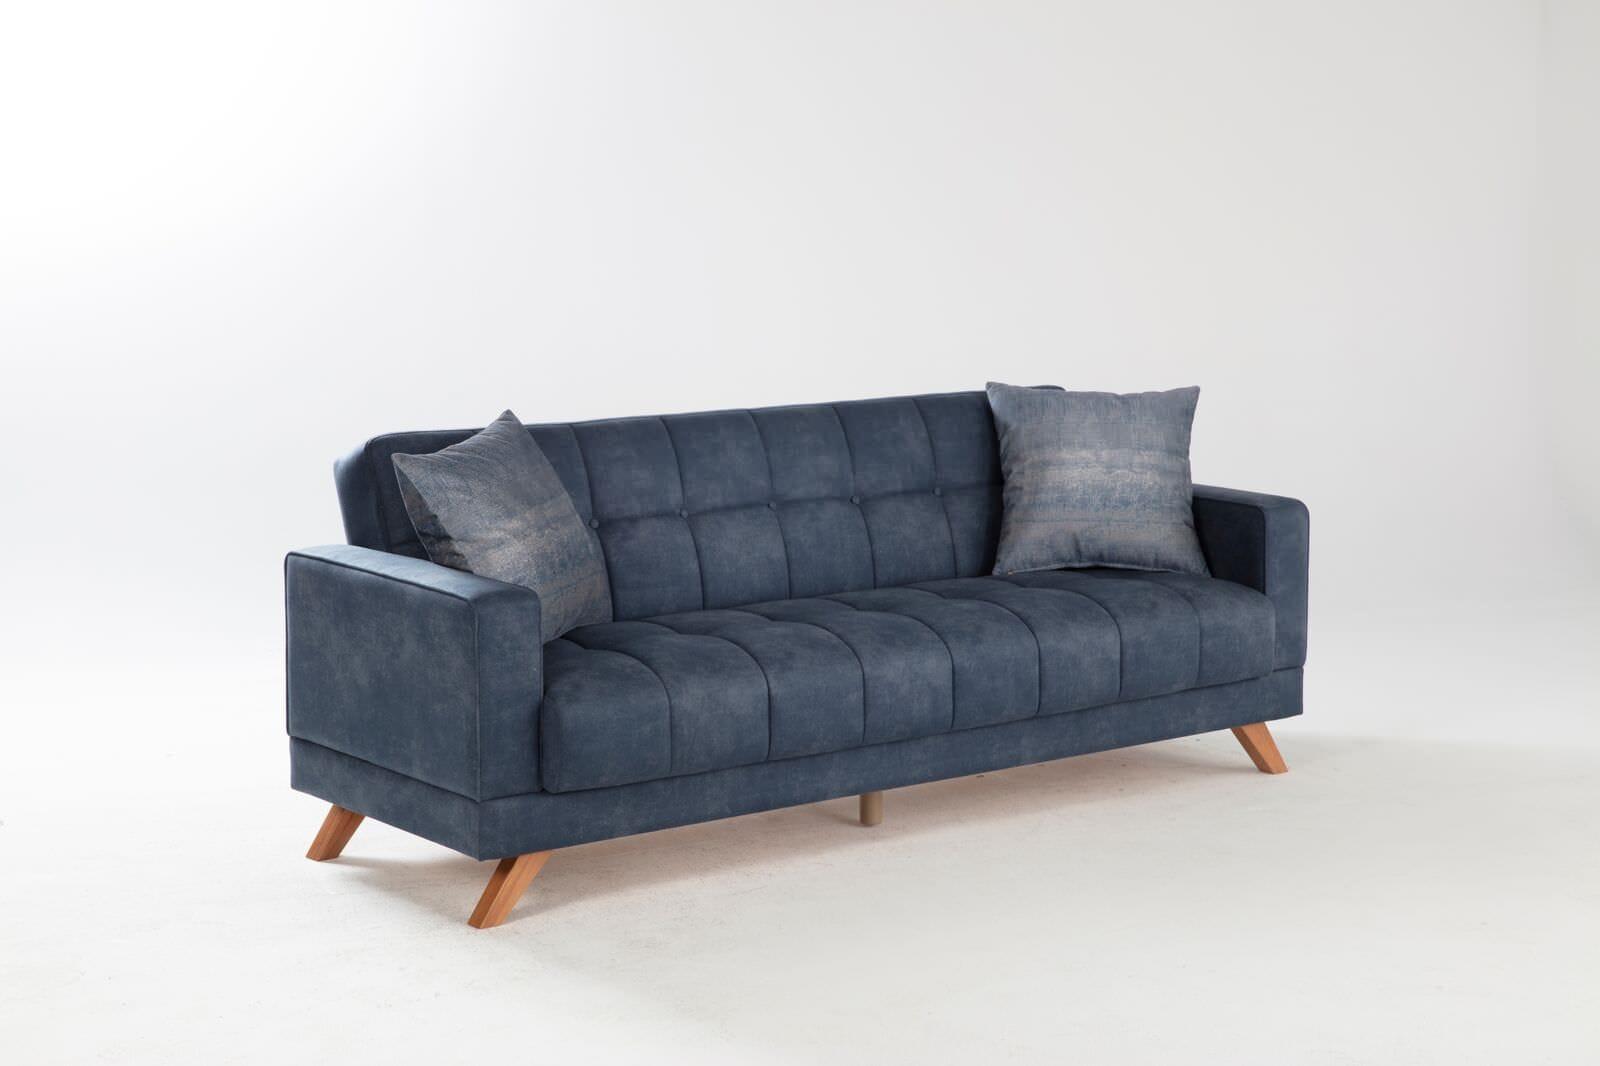 Montana Yakut Navy Convertible Sofa Bed By Istikbal Furniture